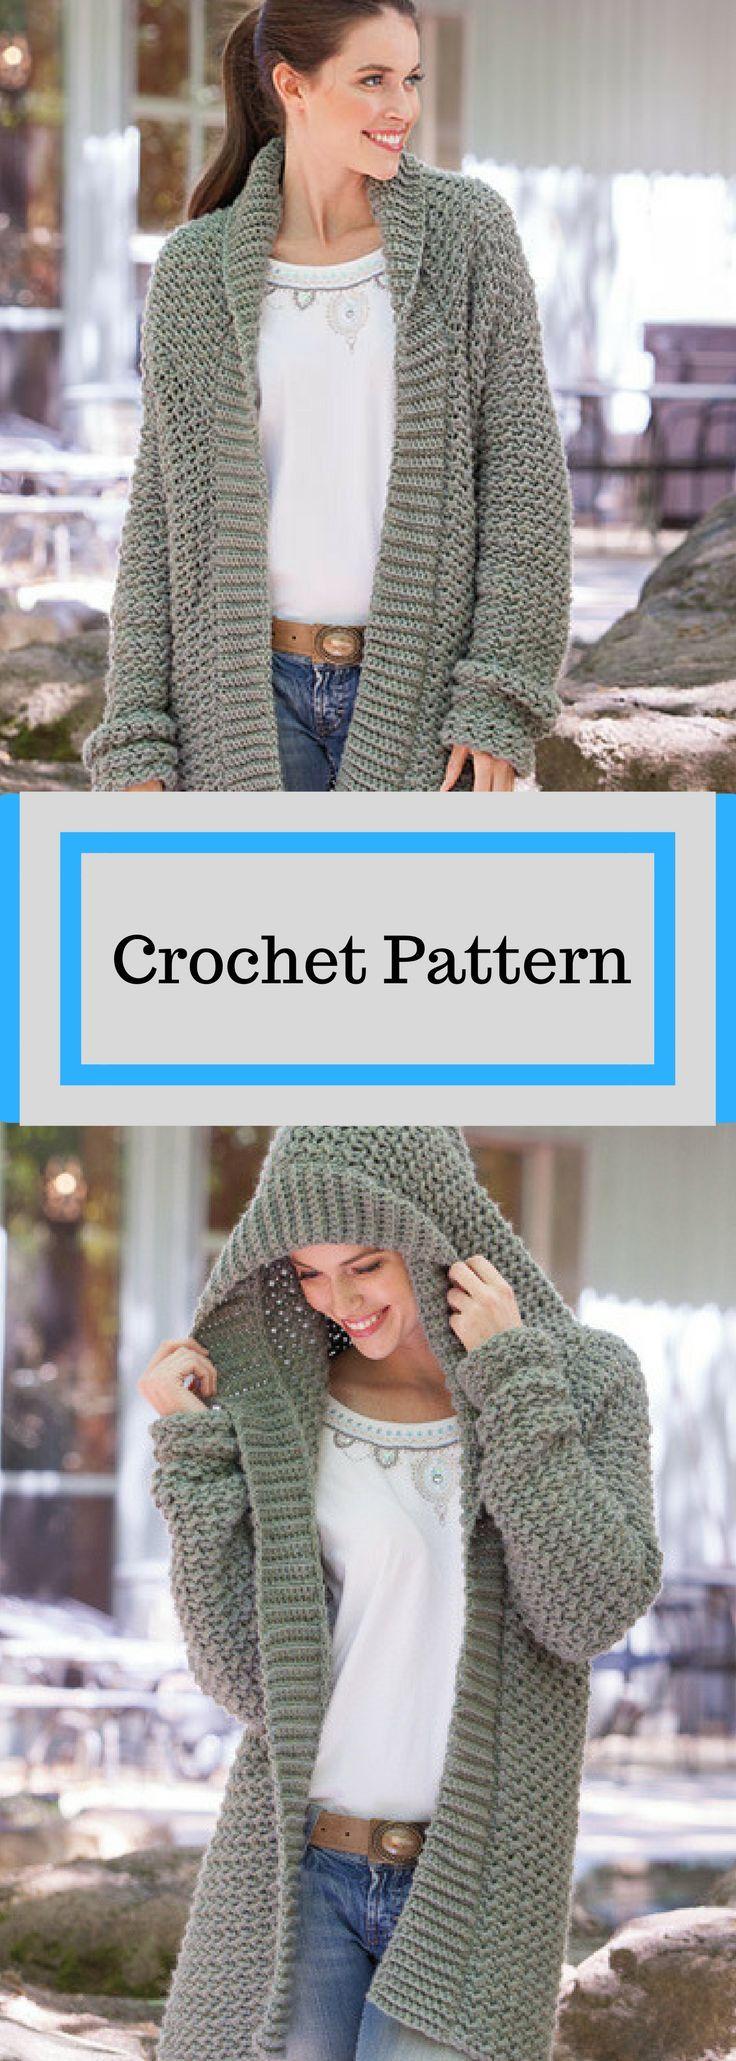 Weekend Casual Hooded Sweater Crochet Pattern Avai…